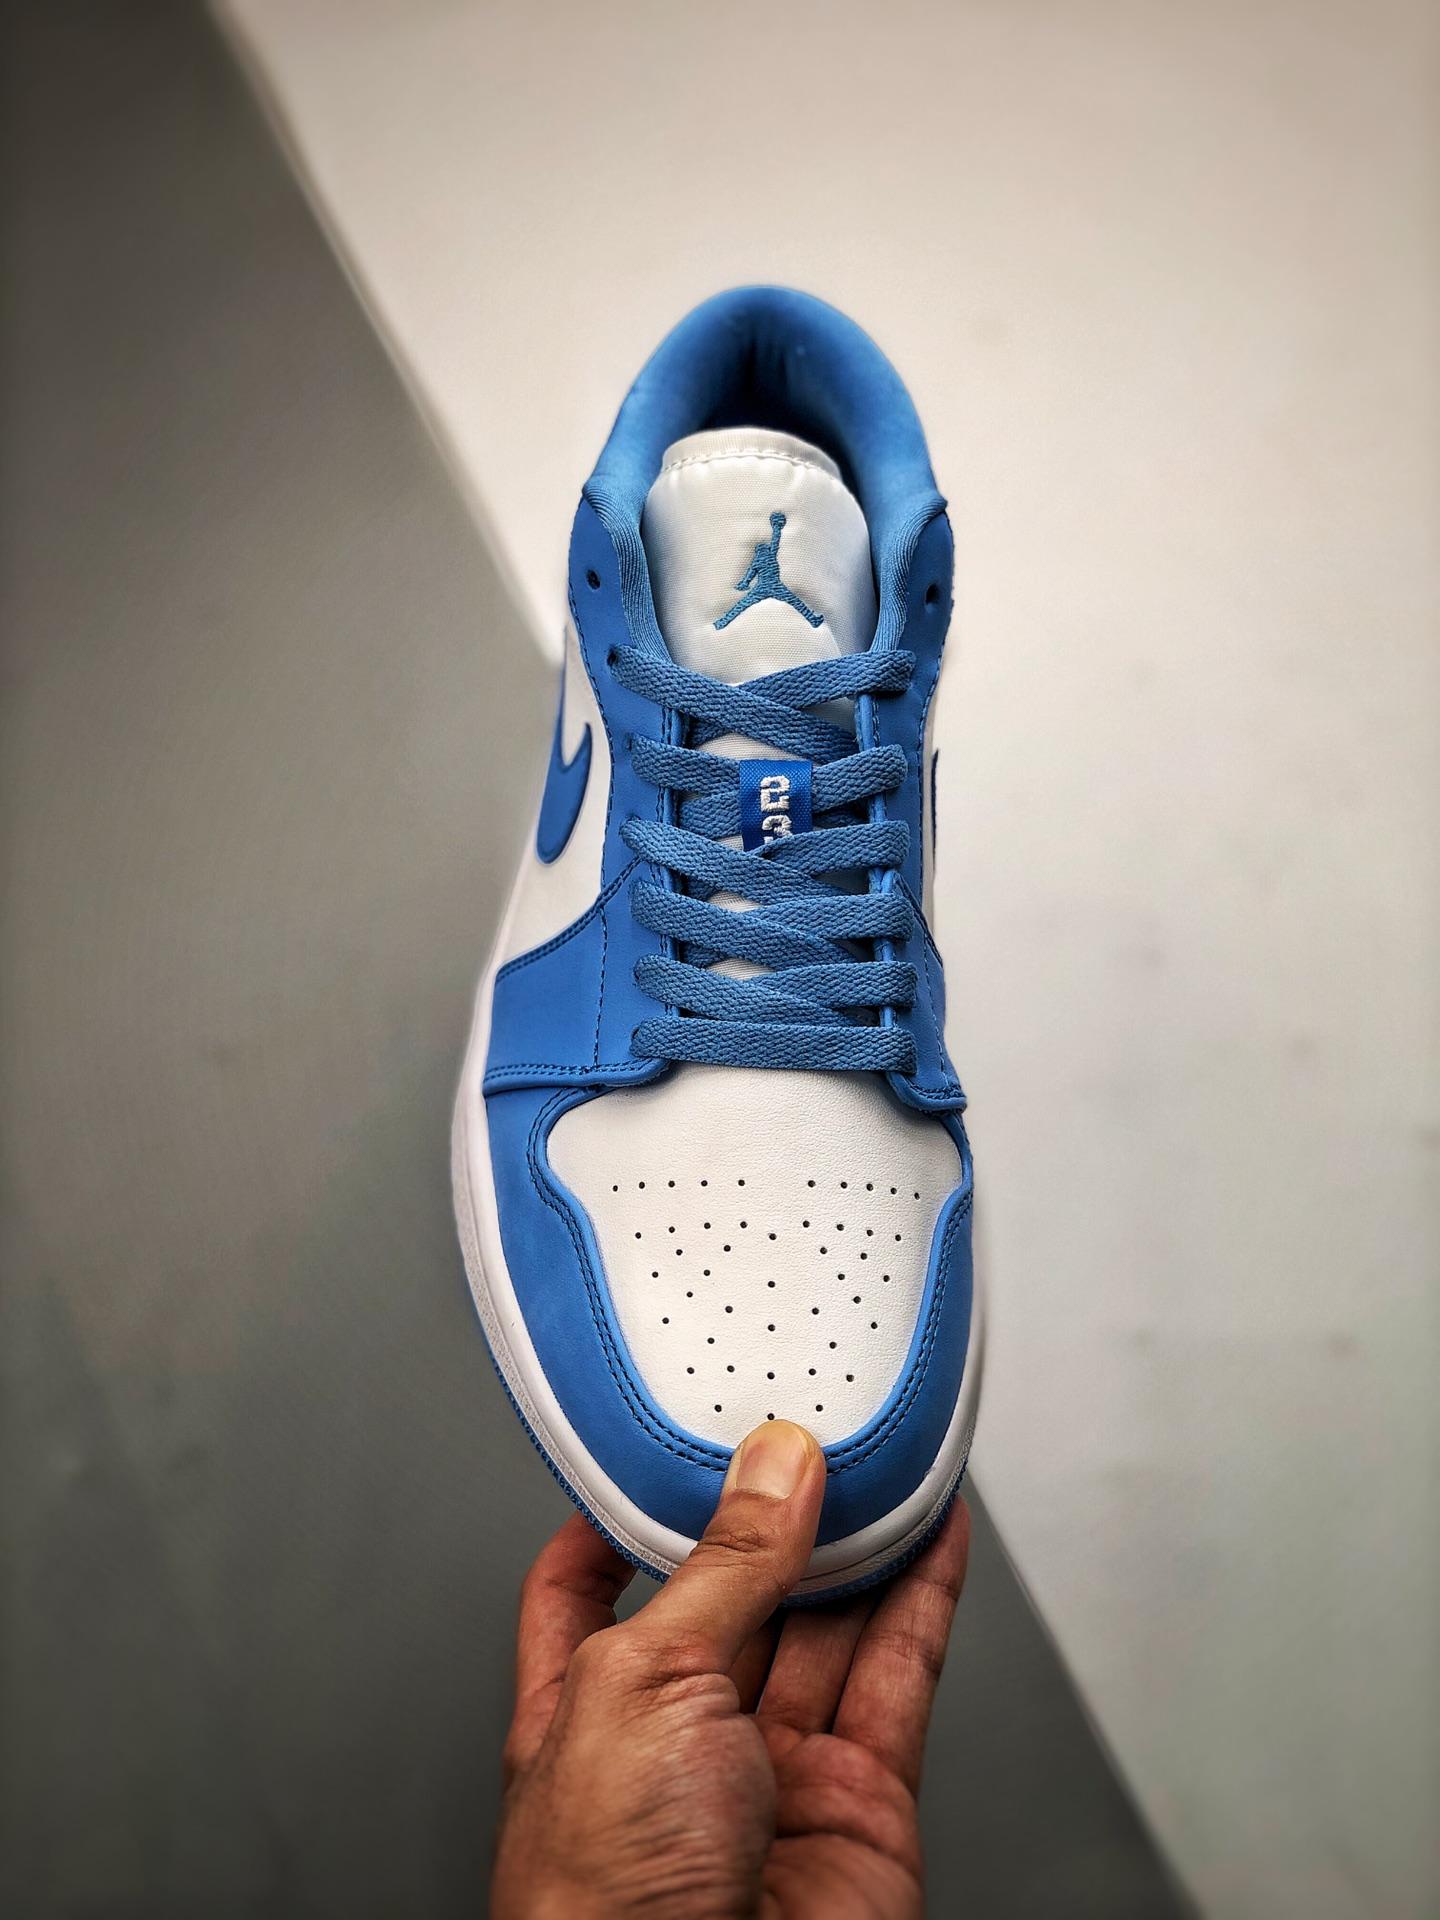 "S2低帮low系列 AJ1 北卡蓝 浅蓝色 货号:AO9944-441 Air Jordan 1 Low ""UNC""北卡蓝 鞋带位置带有 23 标扣,白底蓝色刺绣_莆田鞋OG版本是最好的么"